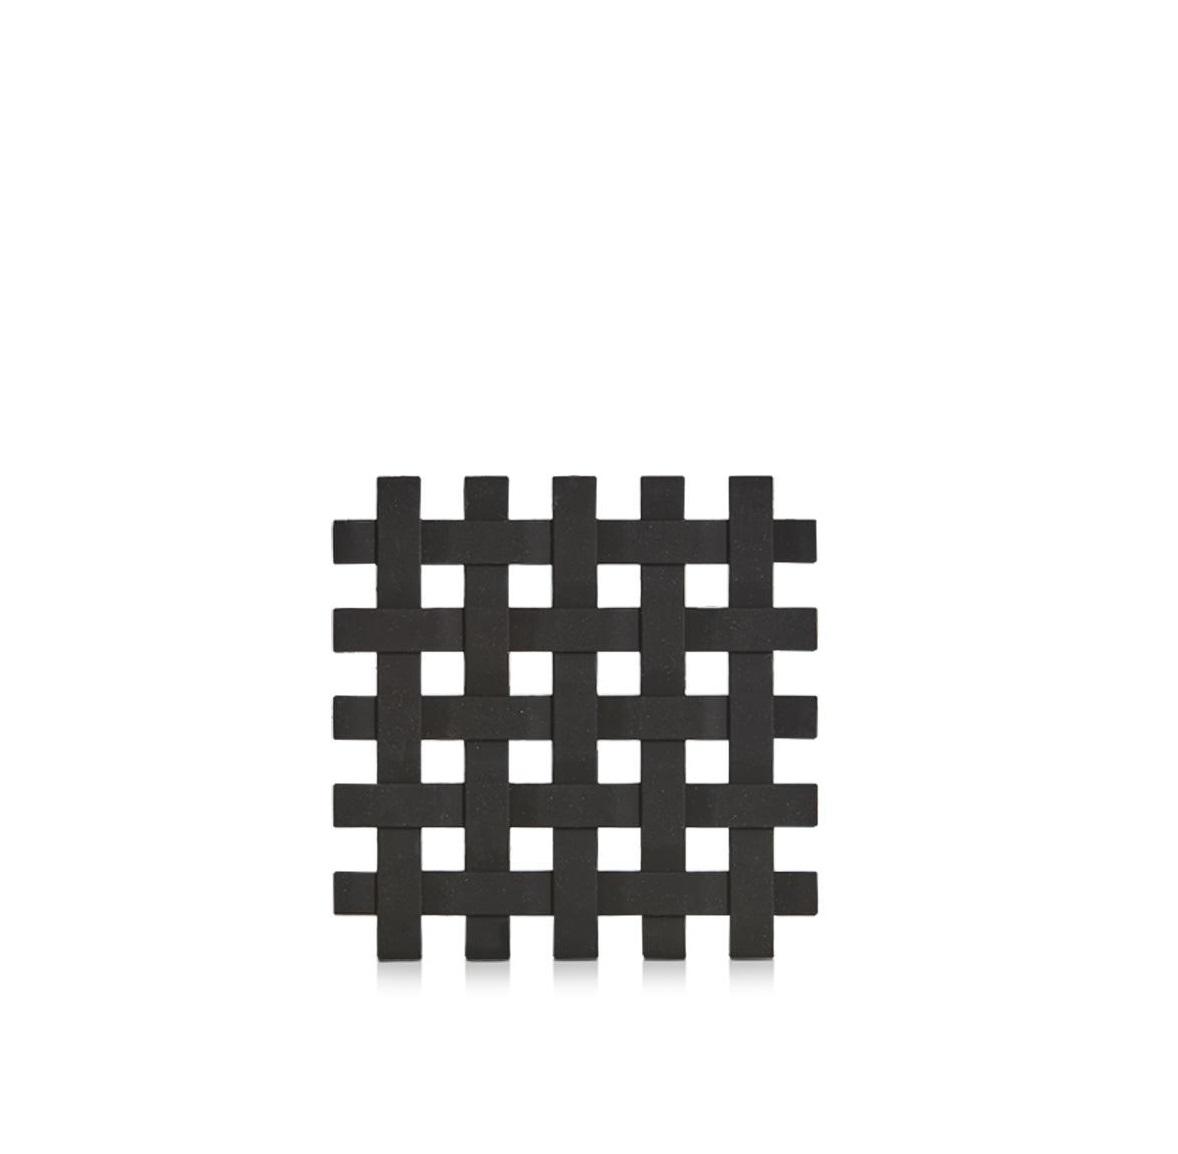 Suport pentru vesela, din plastic Trivet Negru, L17,2xl17,2 cm